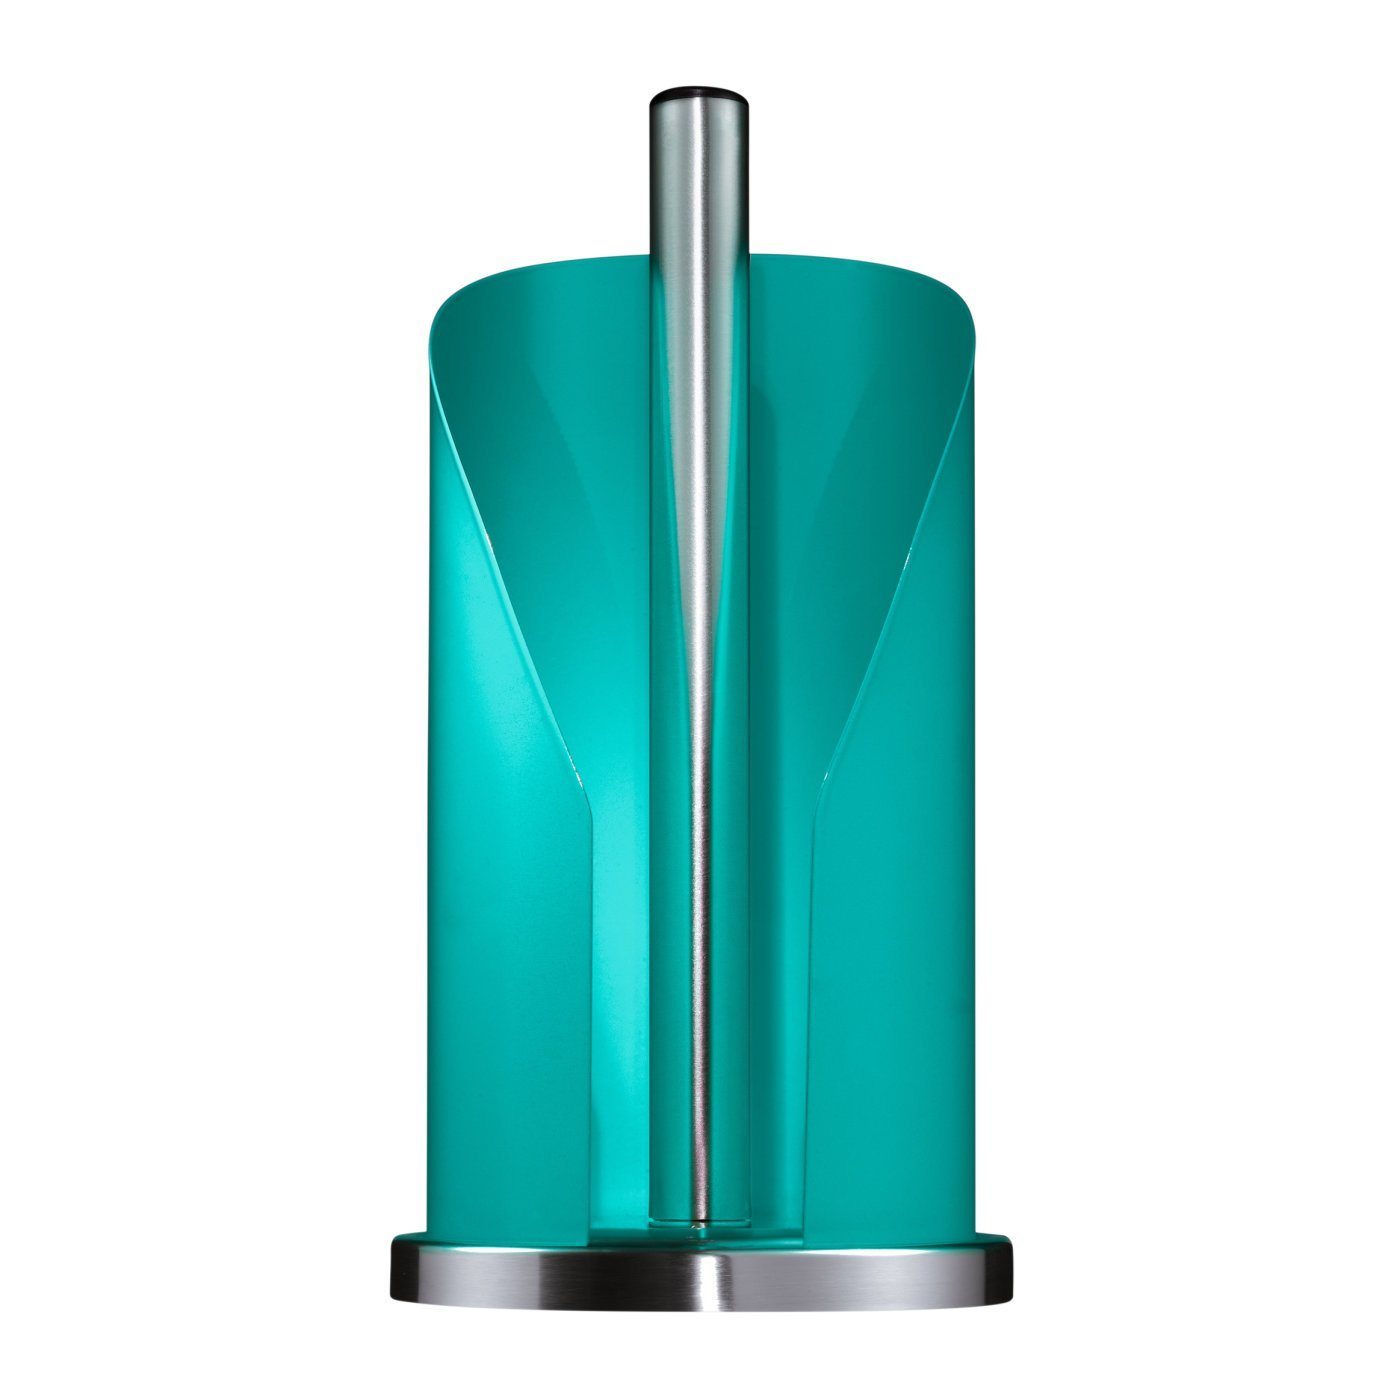 wesco papierrollenhalter t rkis k chenaccessoires k chenrollenhalter. Black Bedroom Furniture Sets. Home Design Ideas